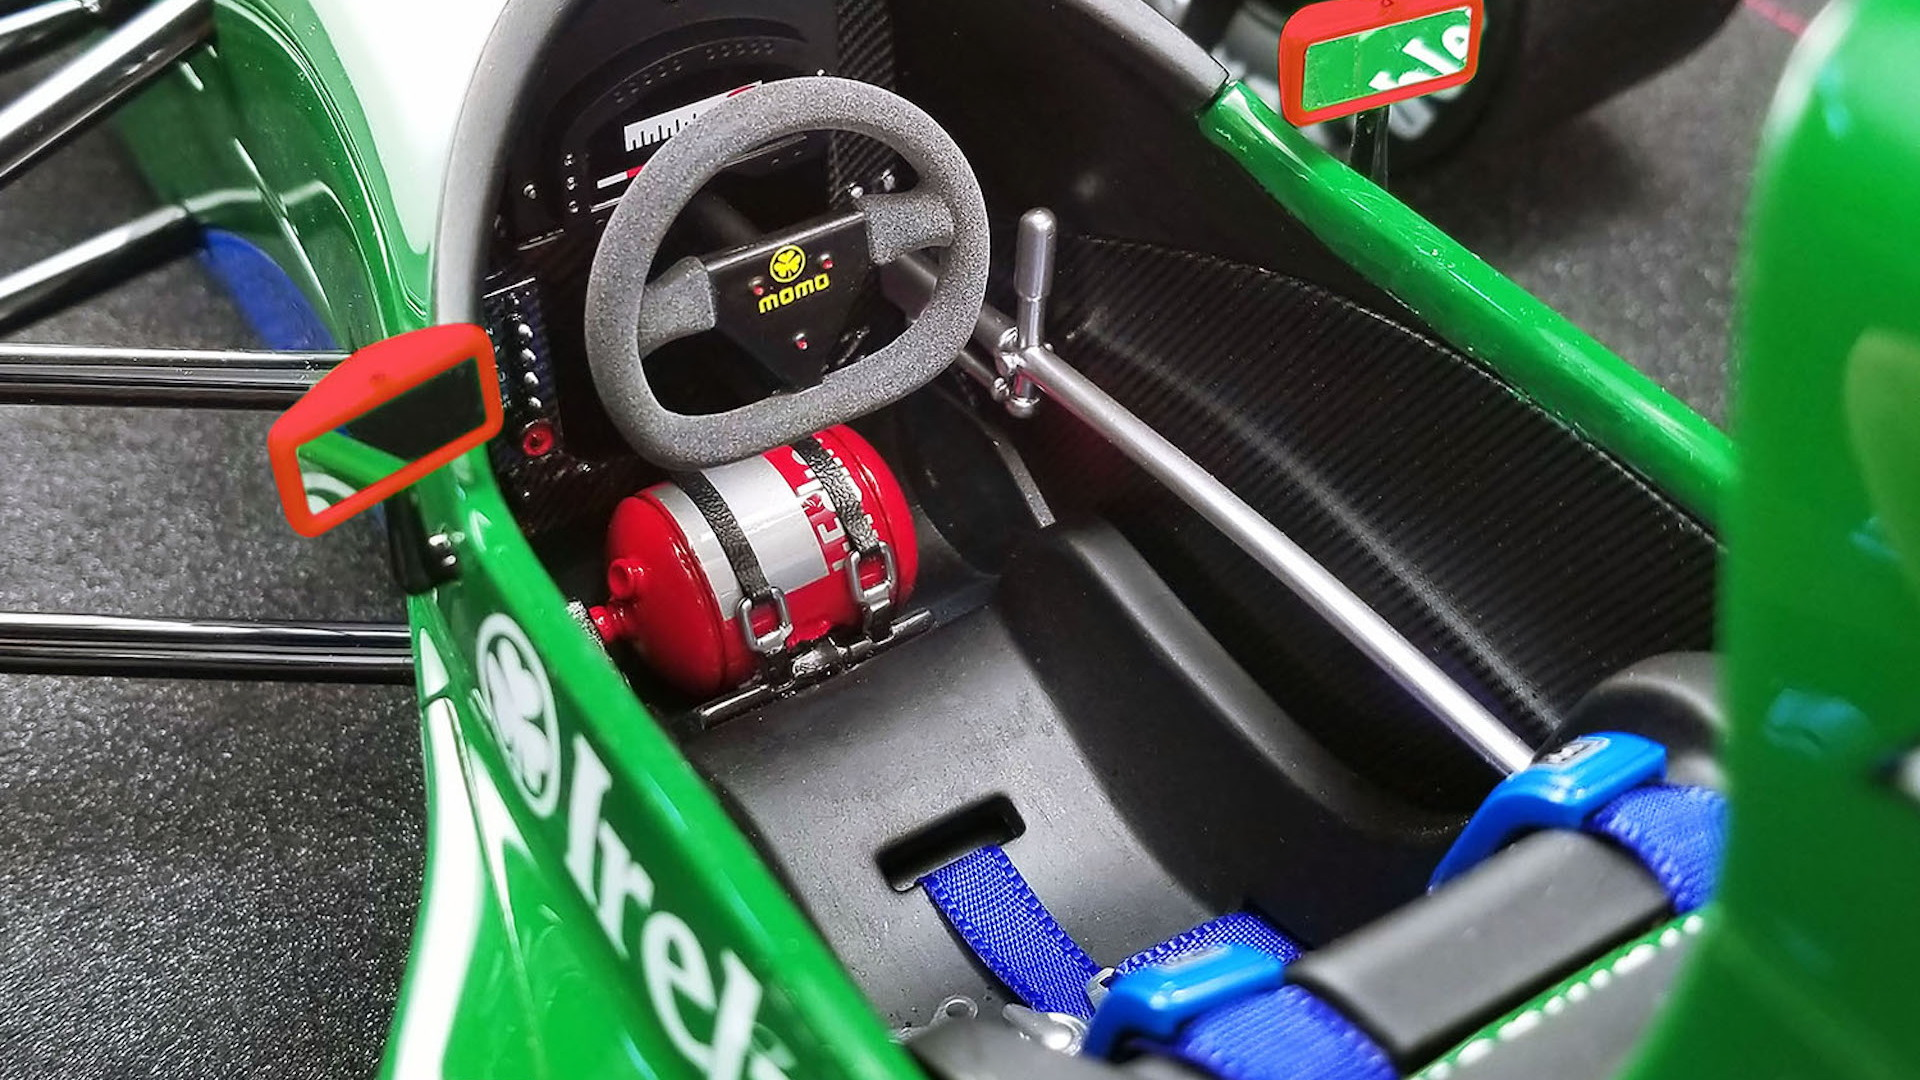 w magazynie kupuj bestsellery wykwintny design You can buy Michael Schumacher's Jordan F1 car for $4,495